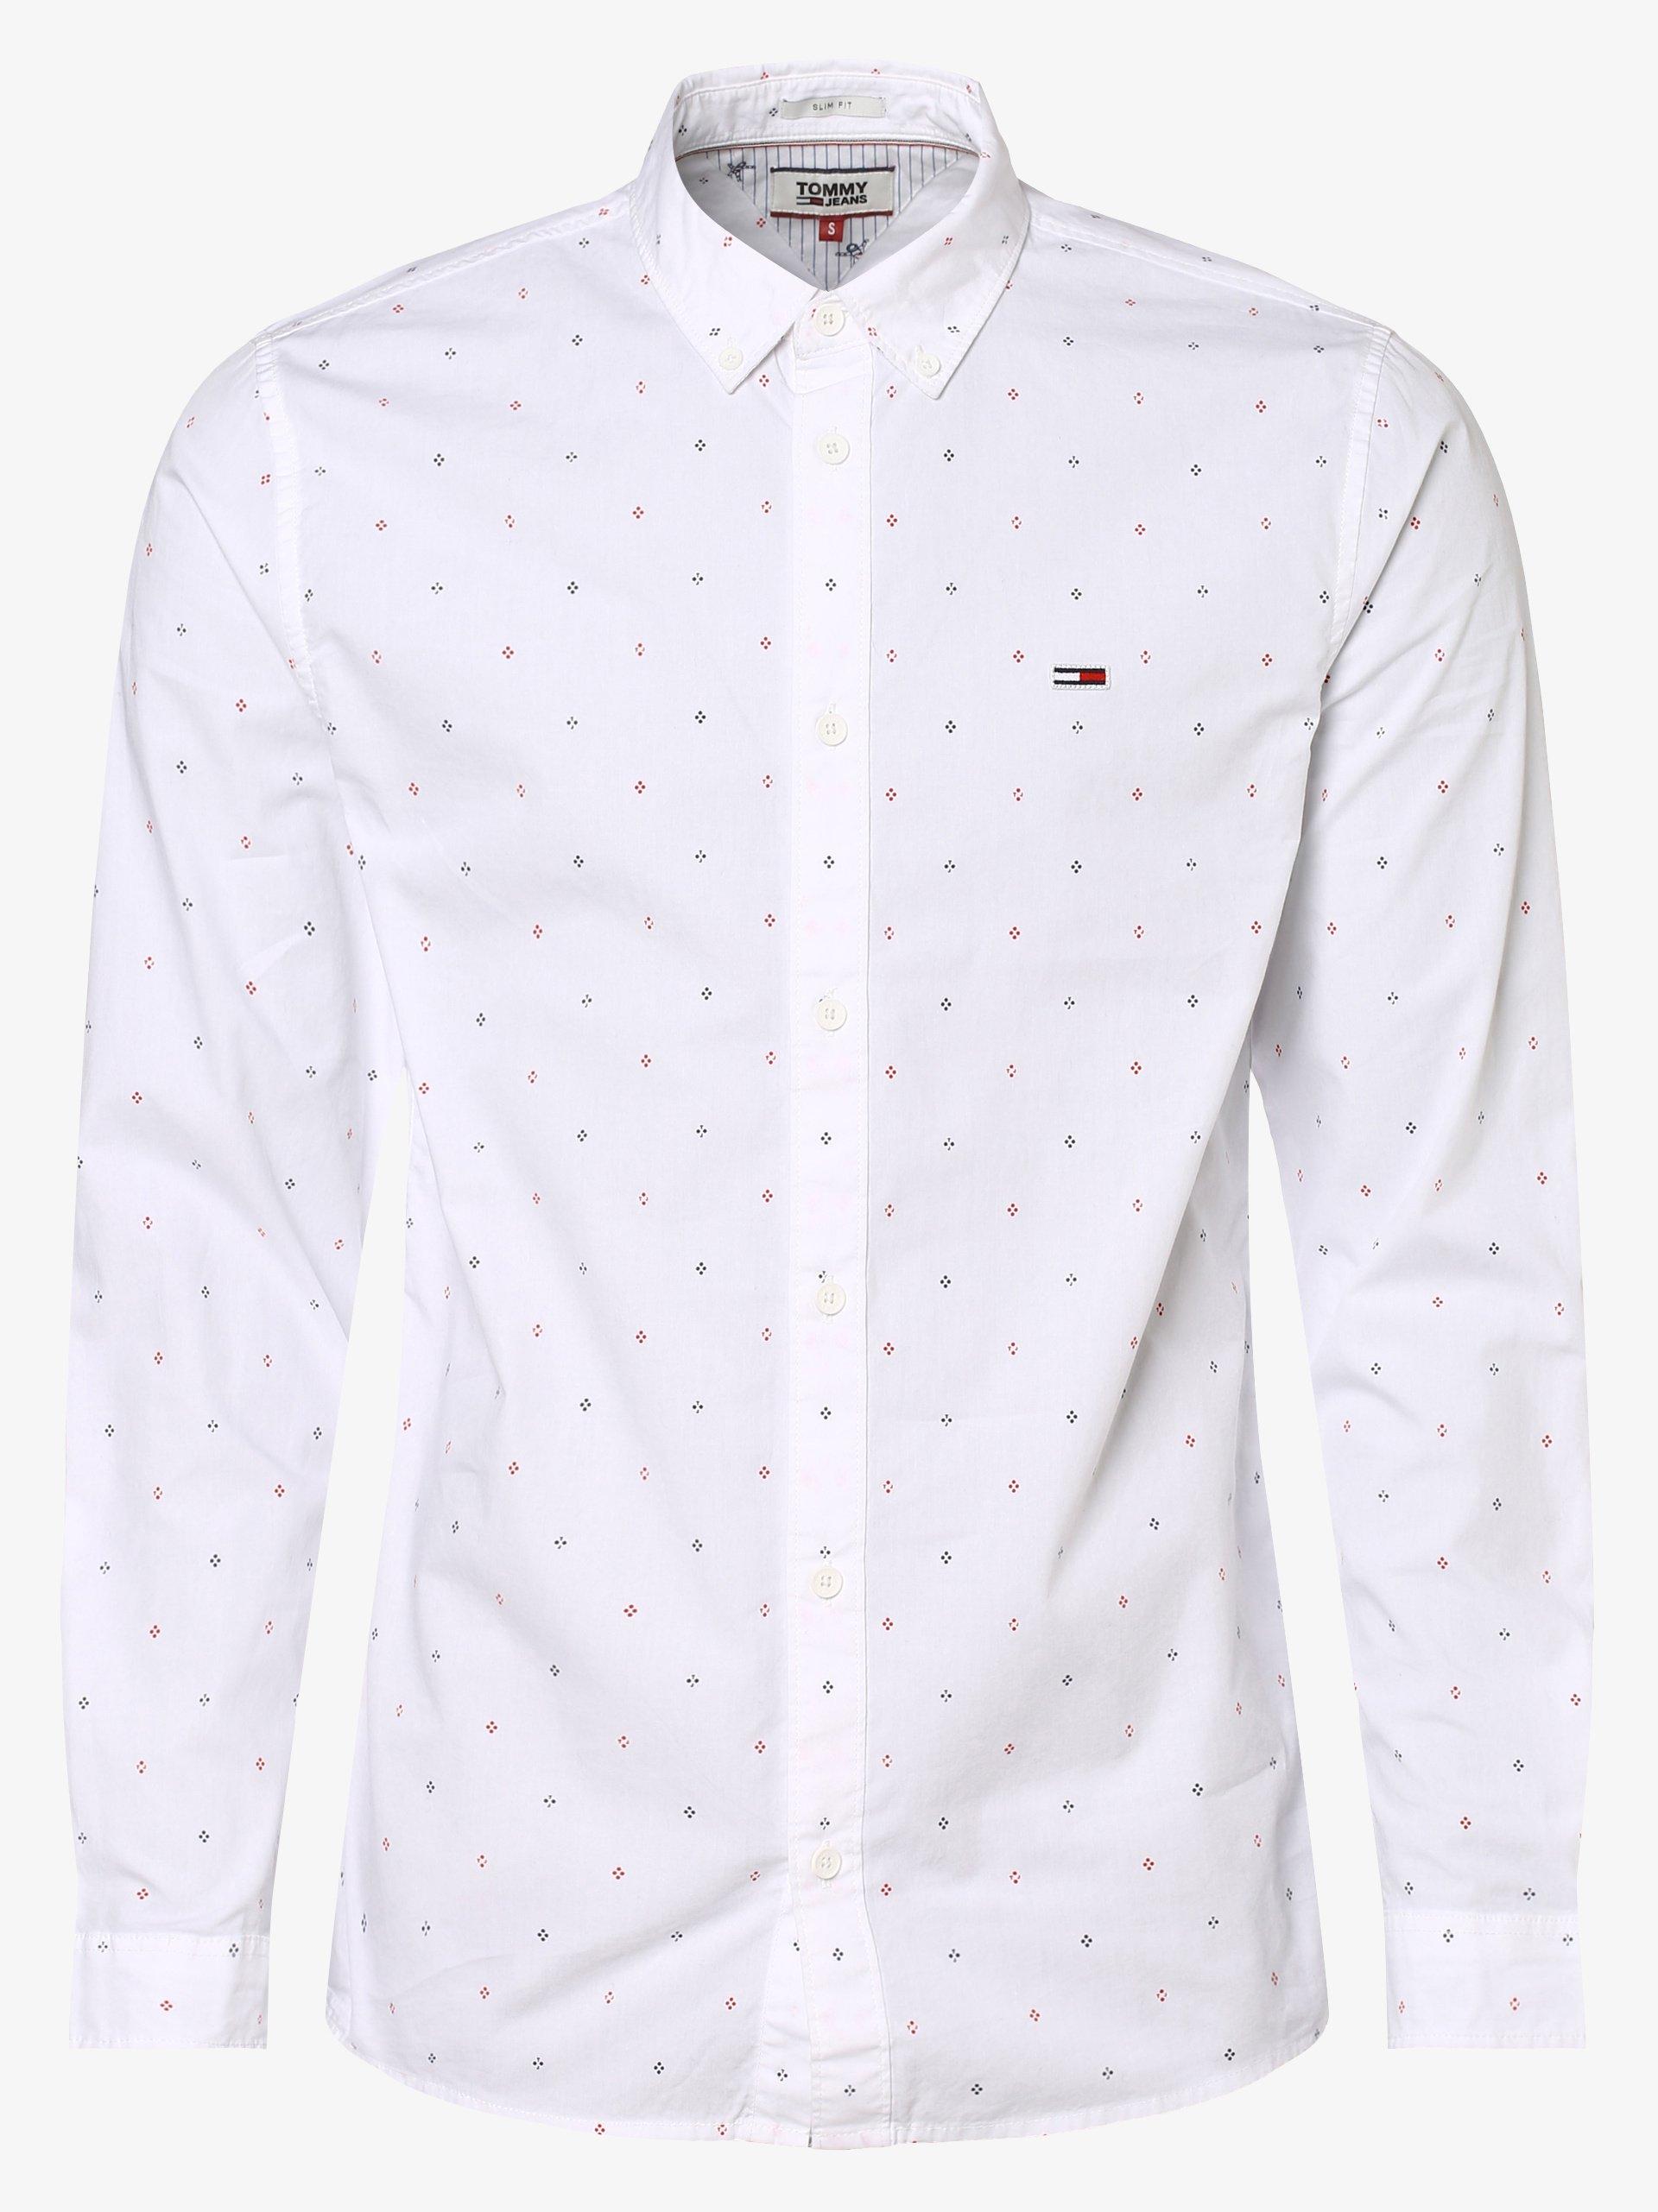 Tommy Jeans Herren Hemd - Ditsy